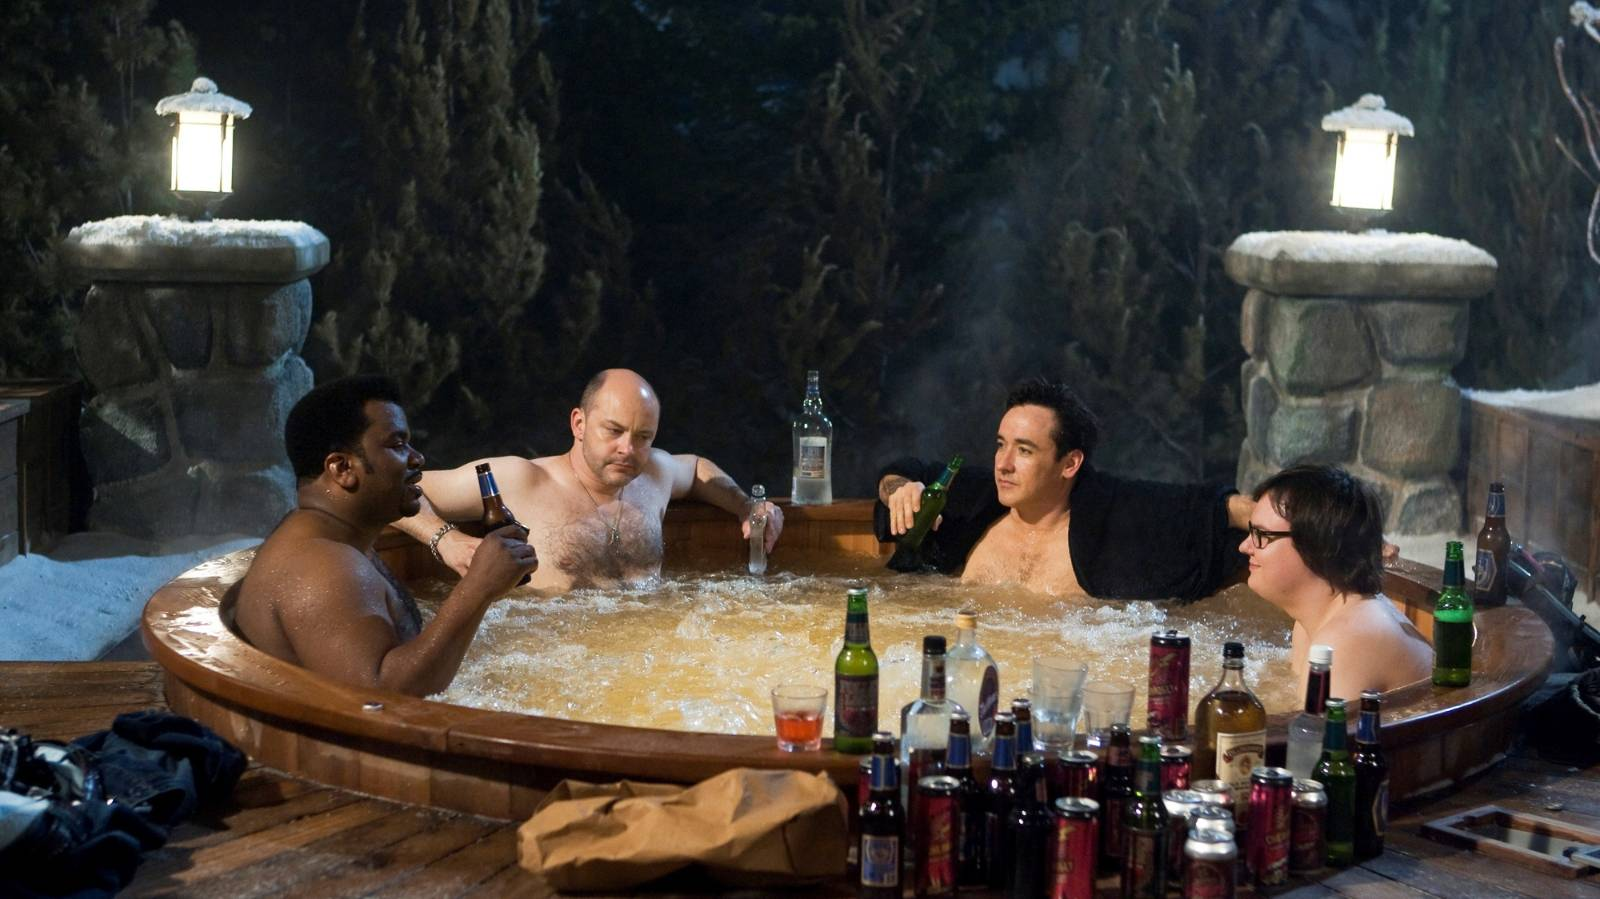 Disney+'s decade-old Hot Tub offers joyful nostalgic hit for Gen-Xers